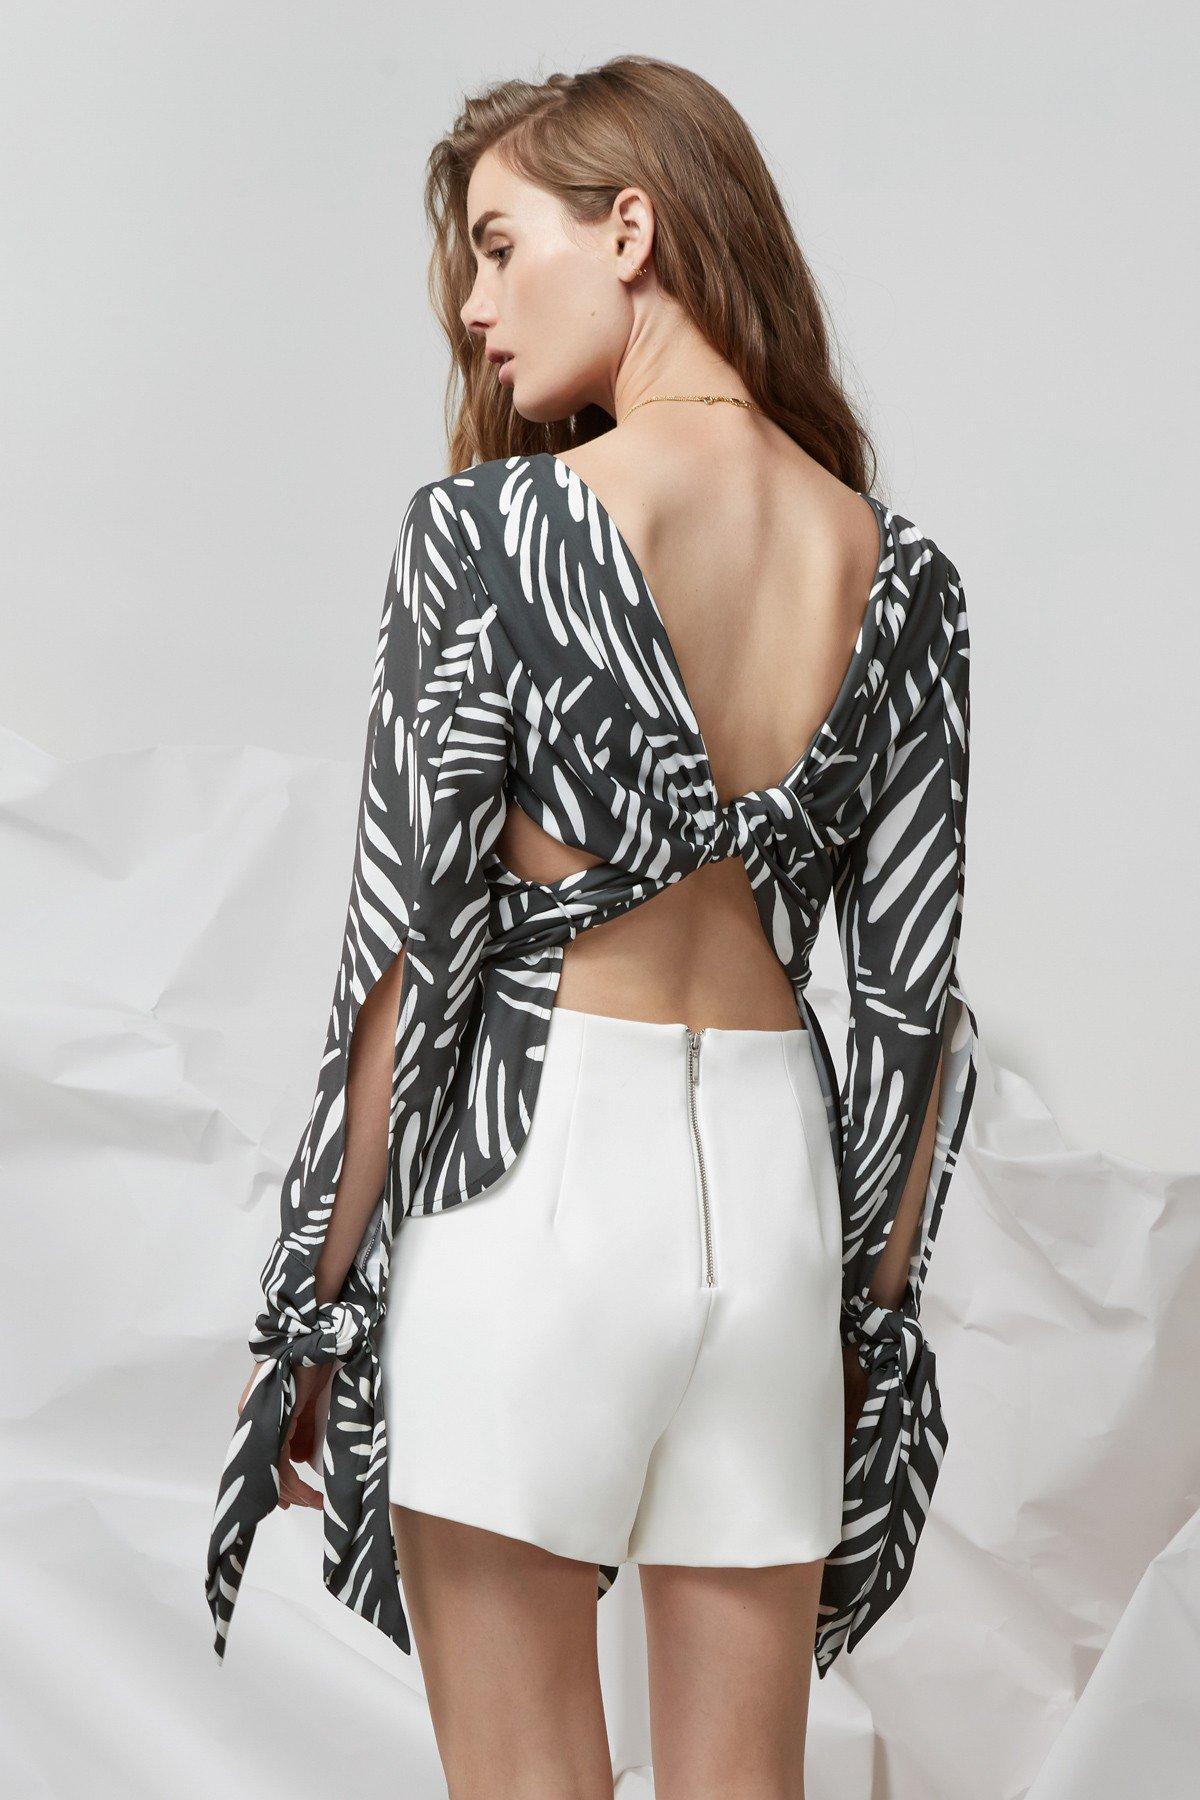 Shop Finders I Spy Tie Back Long Sleeve Top.